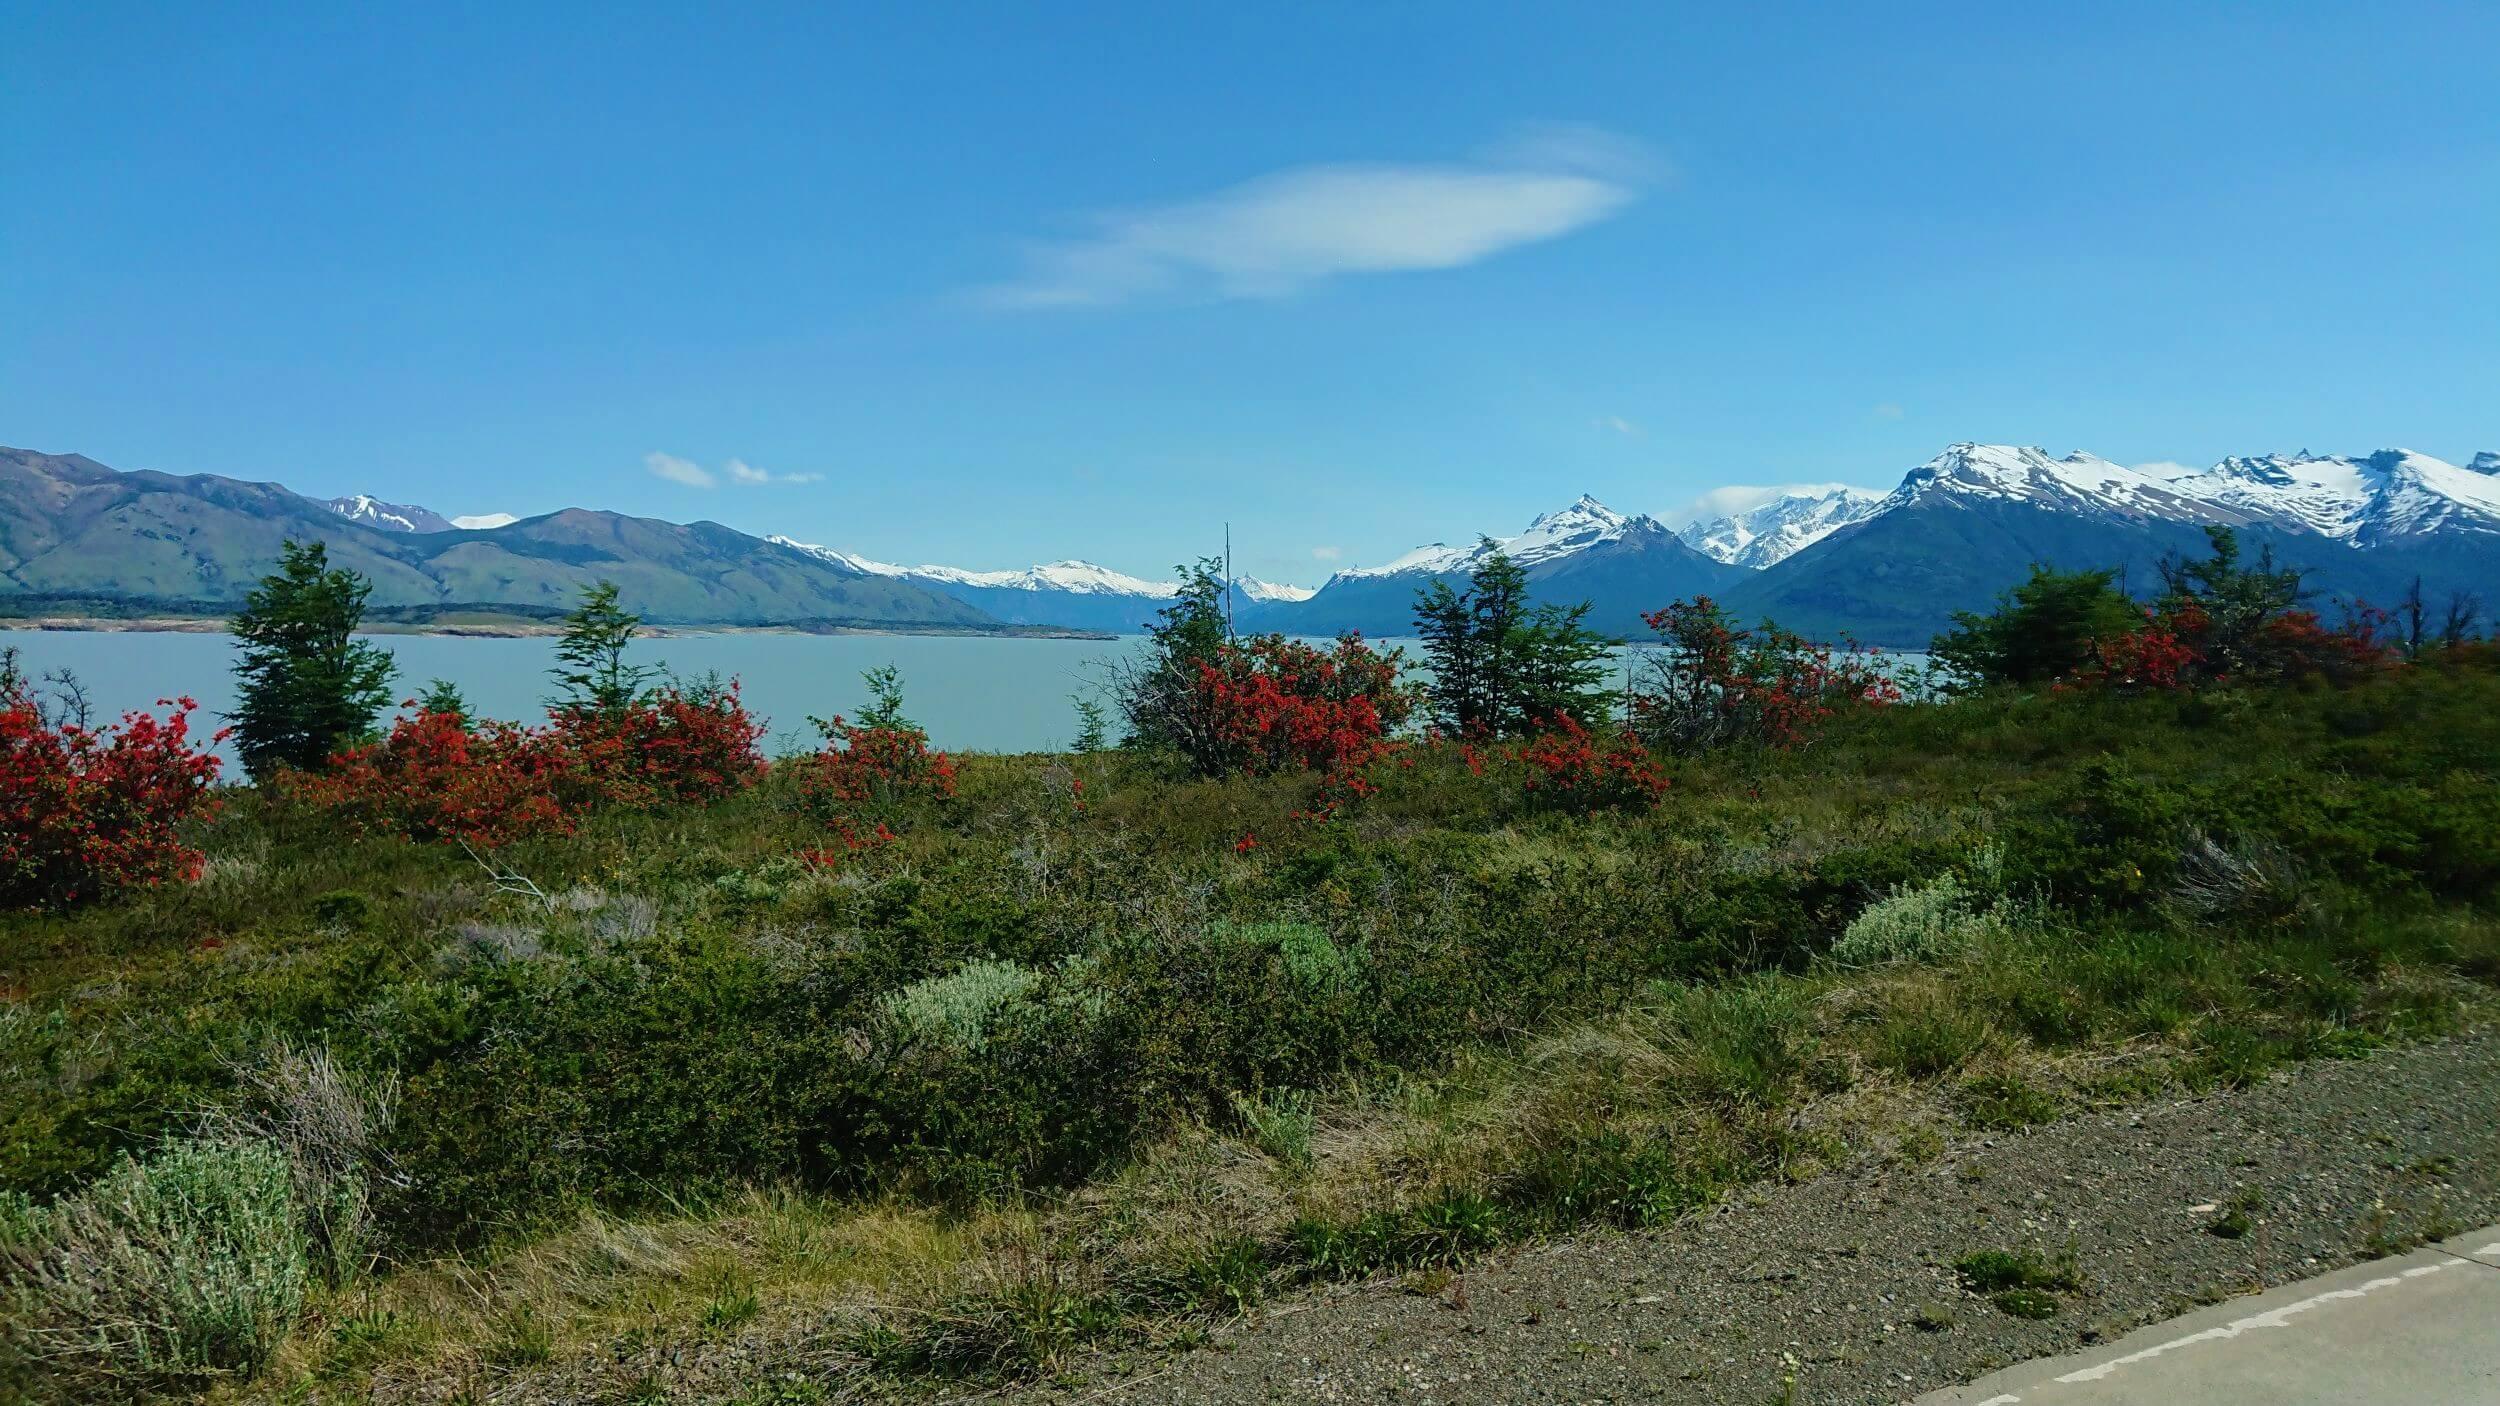 The Glaciers National Park